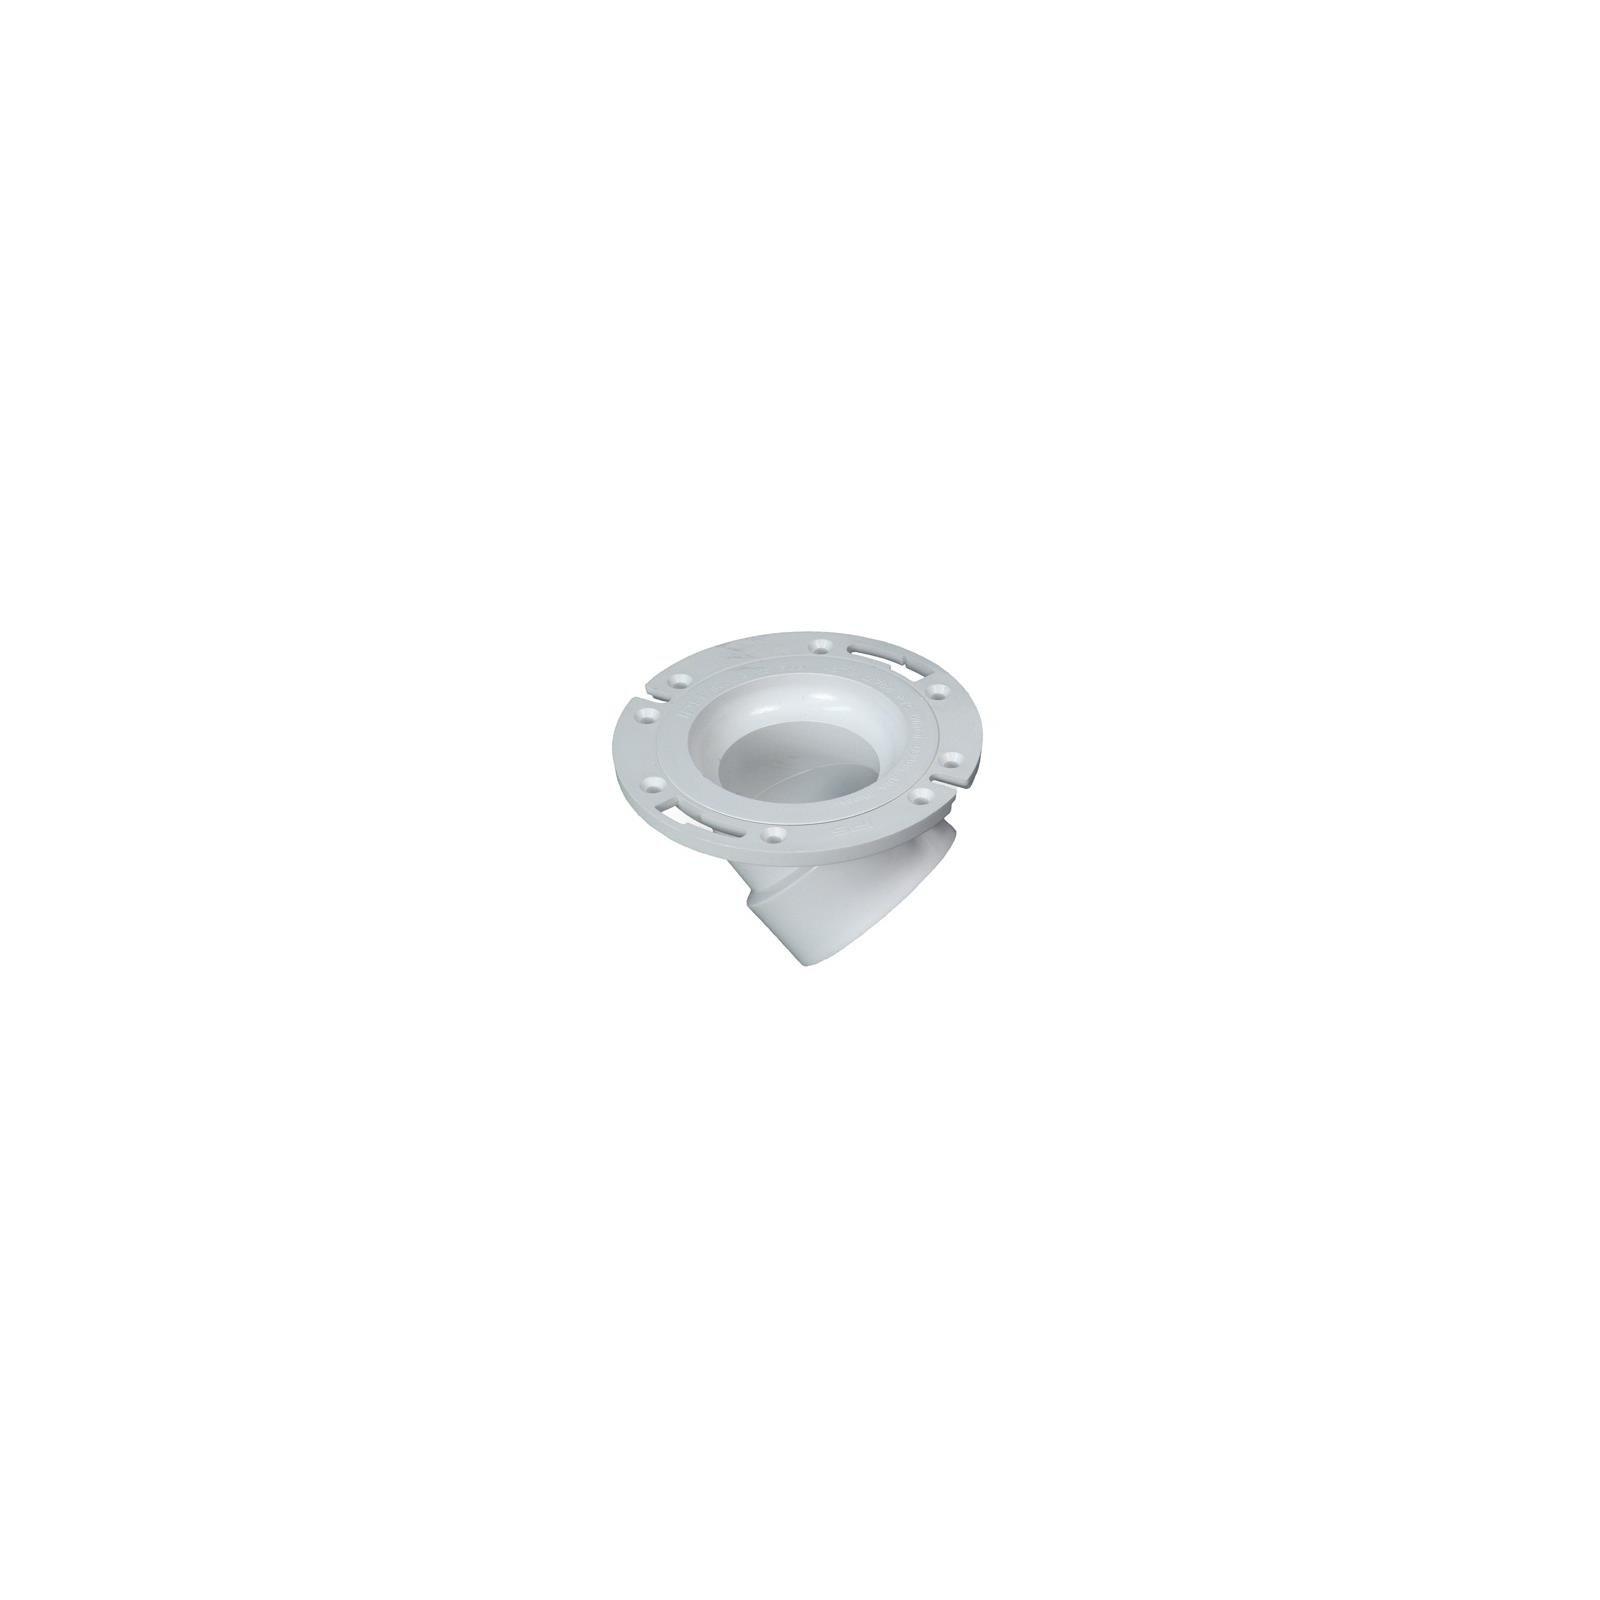 IPS 86196 45DEG PVC Clos Flange - Quantity 20